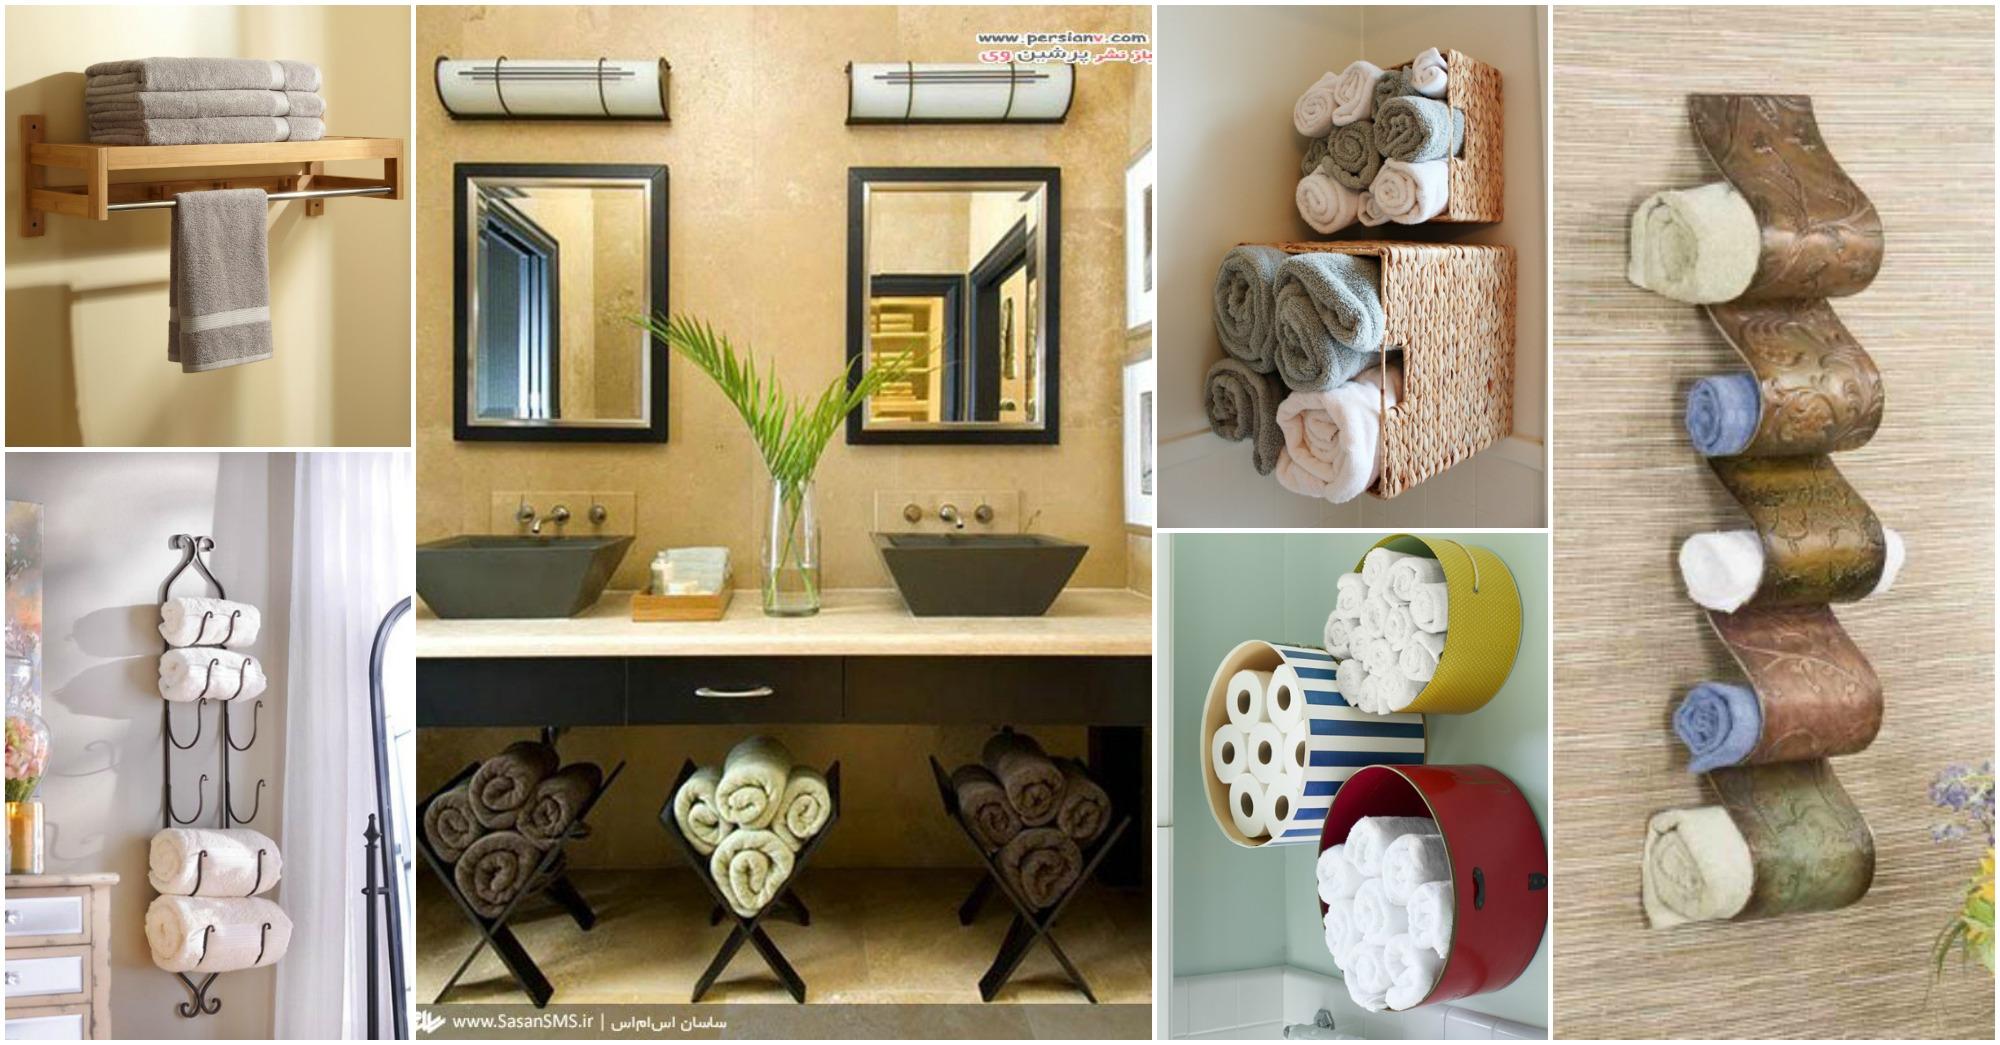 15 Fantastic Bathroom Towel Storage Ideas